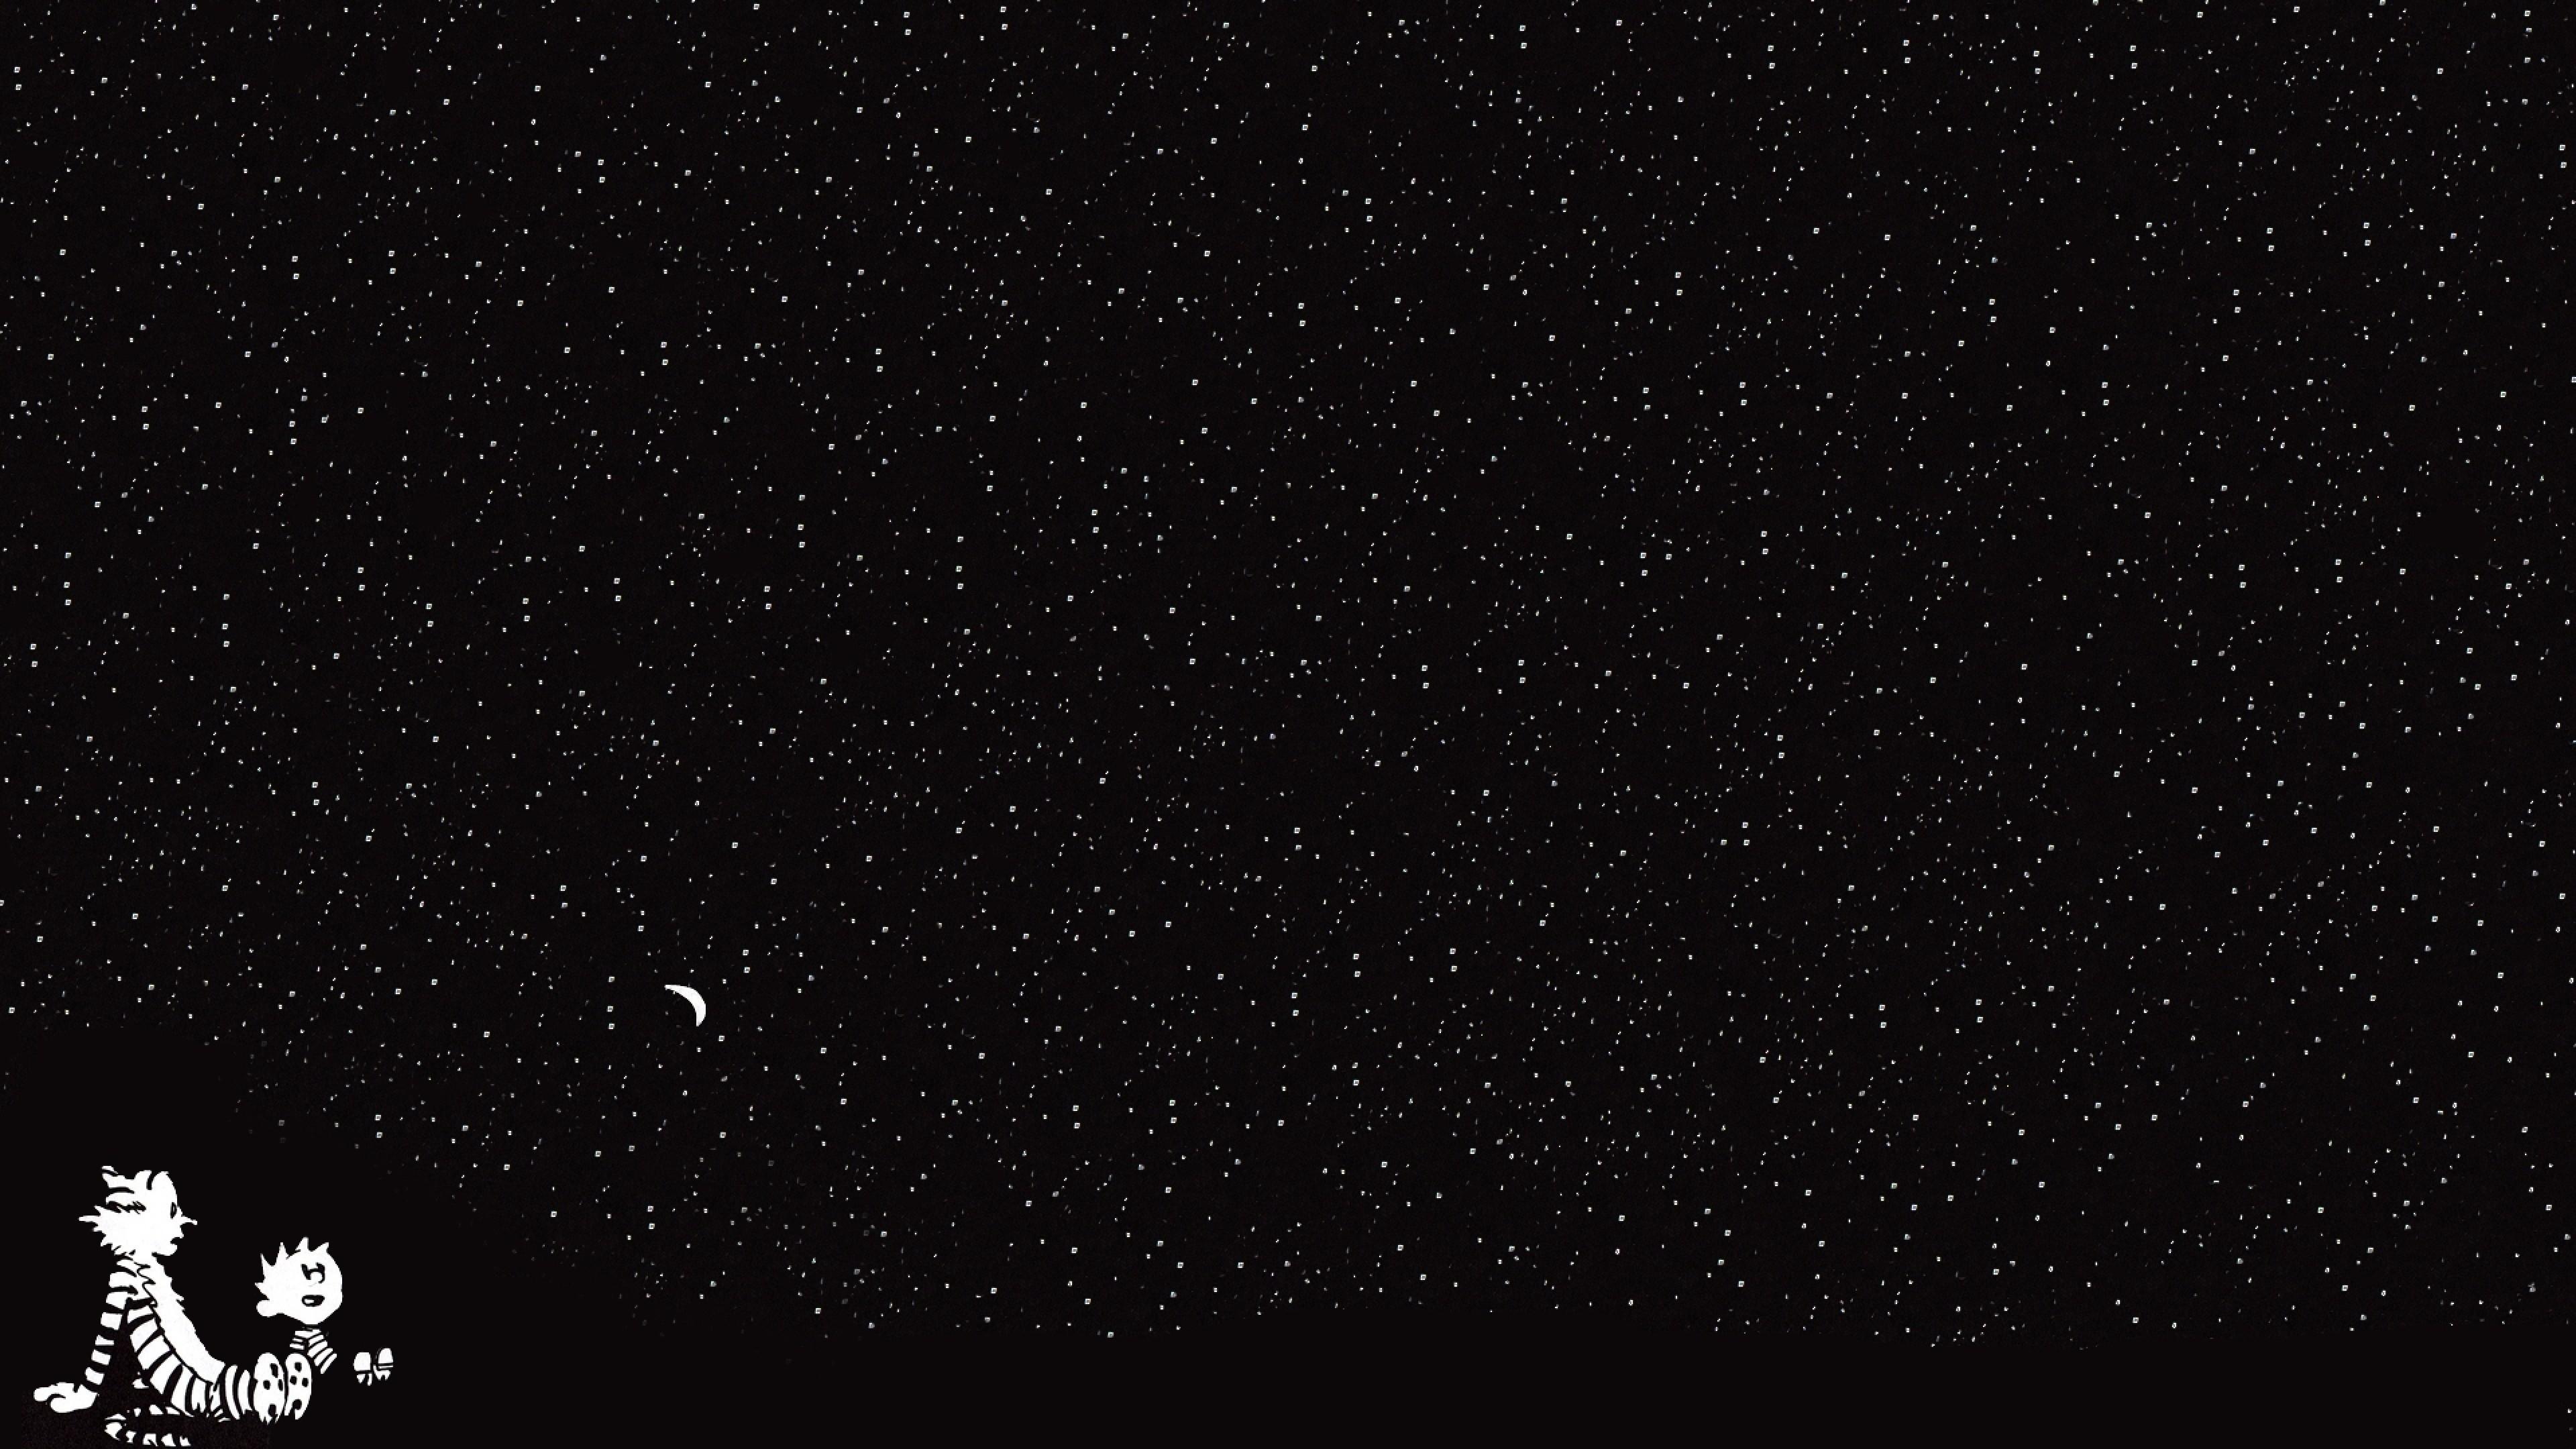 Wallpaper calvin and hobbes, starry sky, cartoon